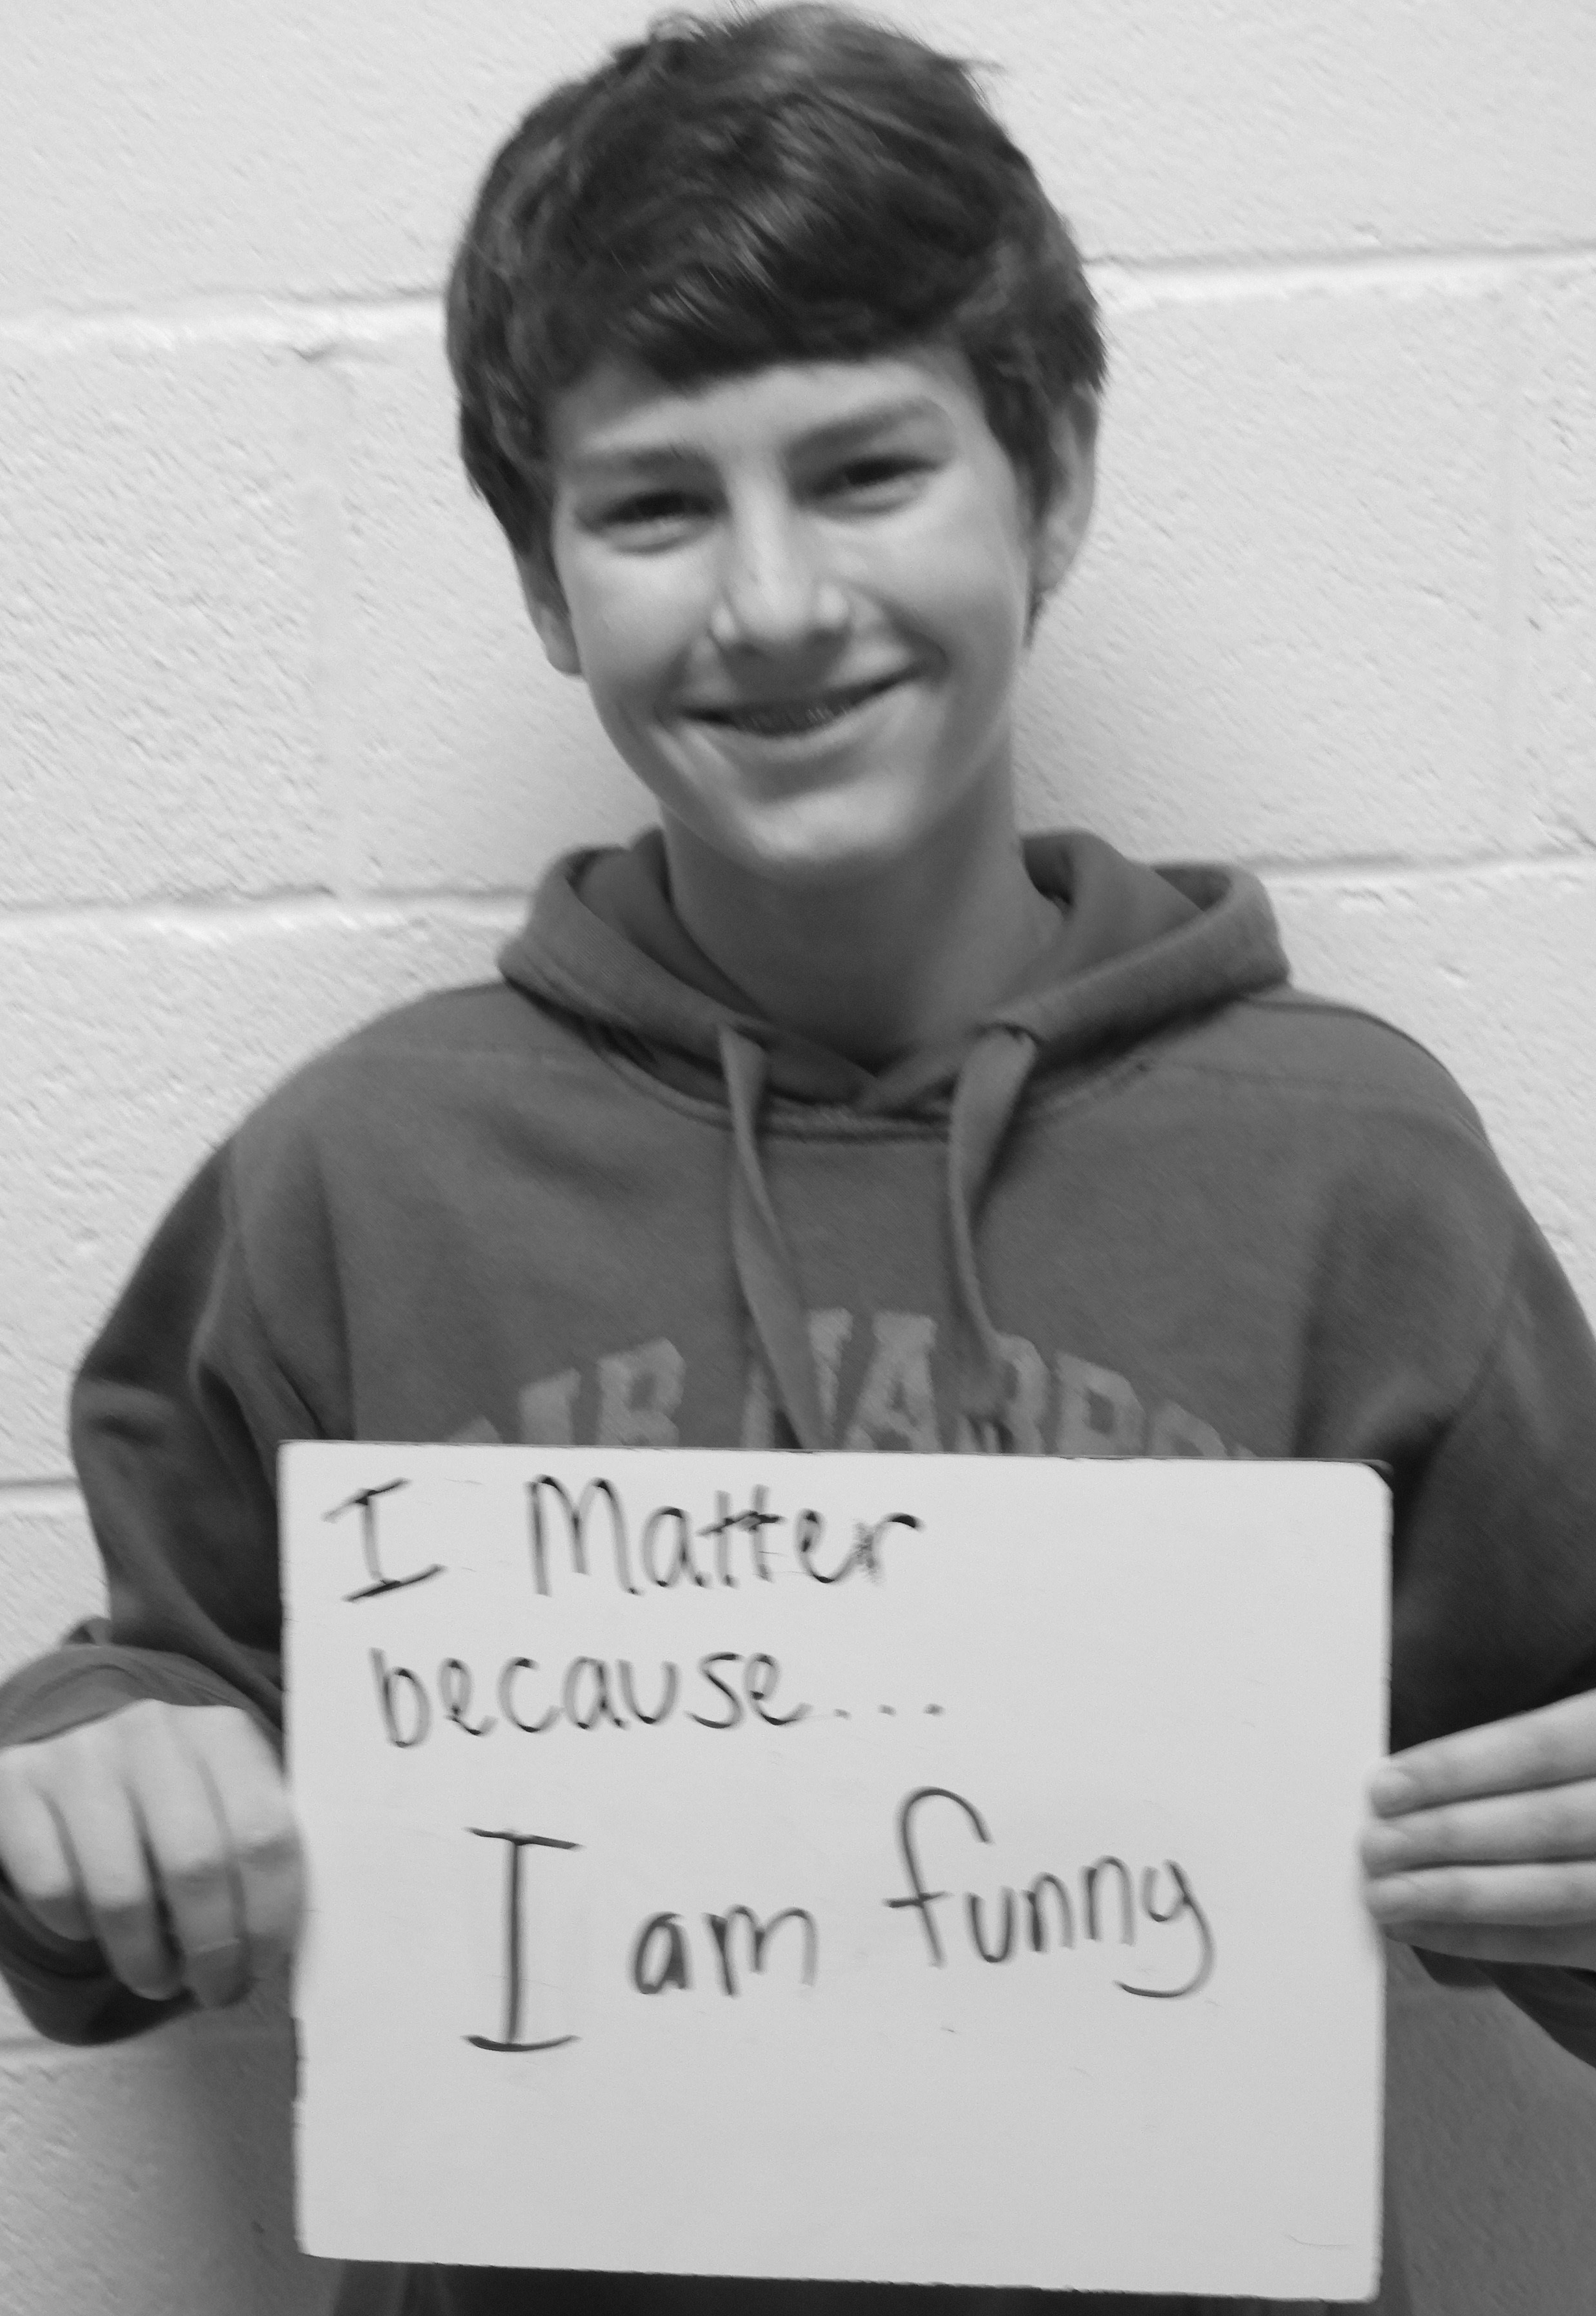 I matter because...I am funny